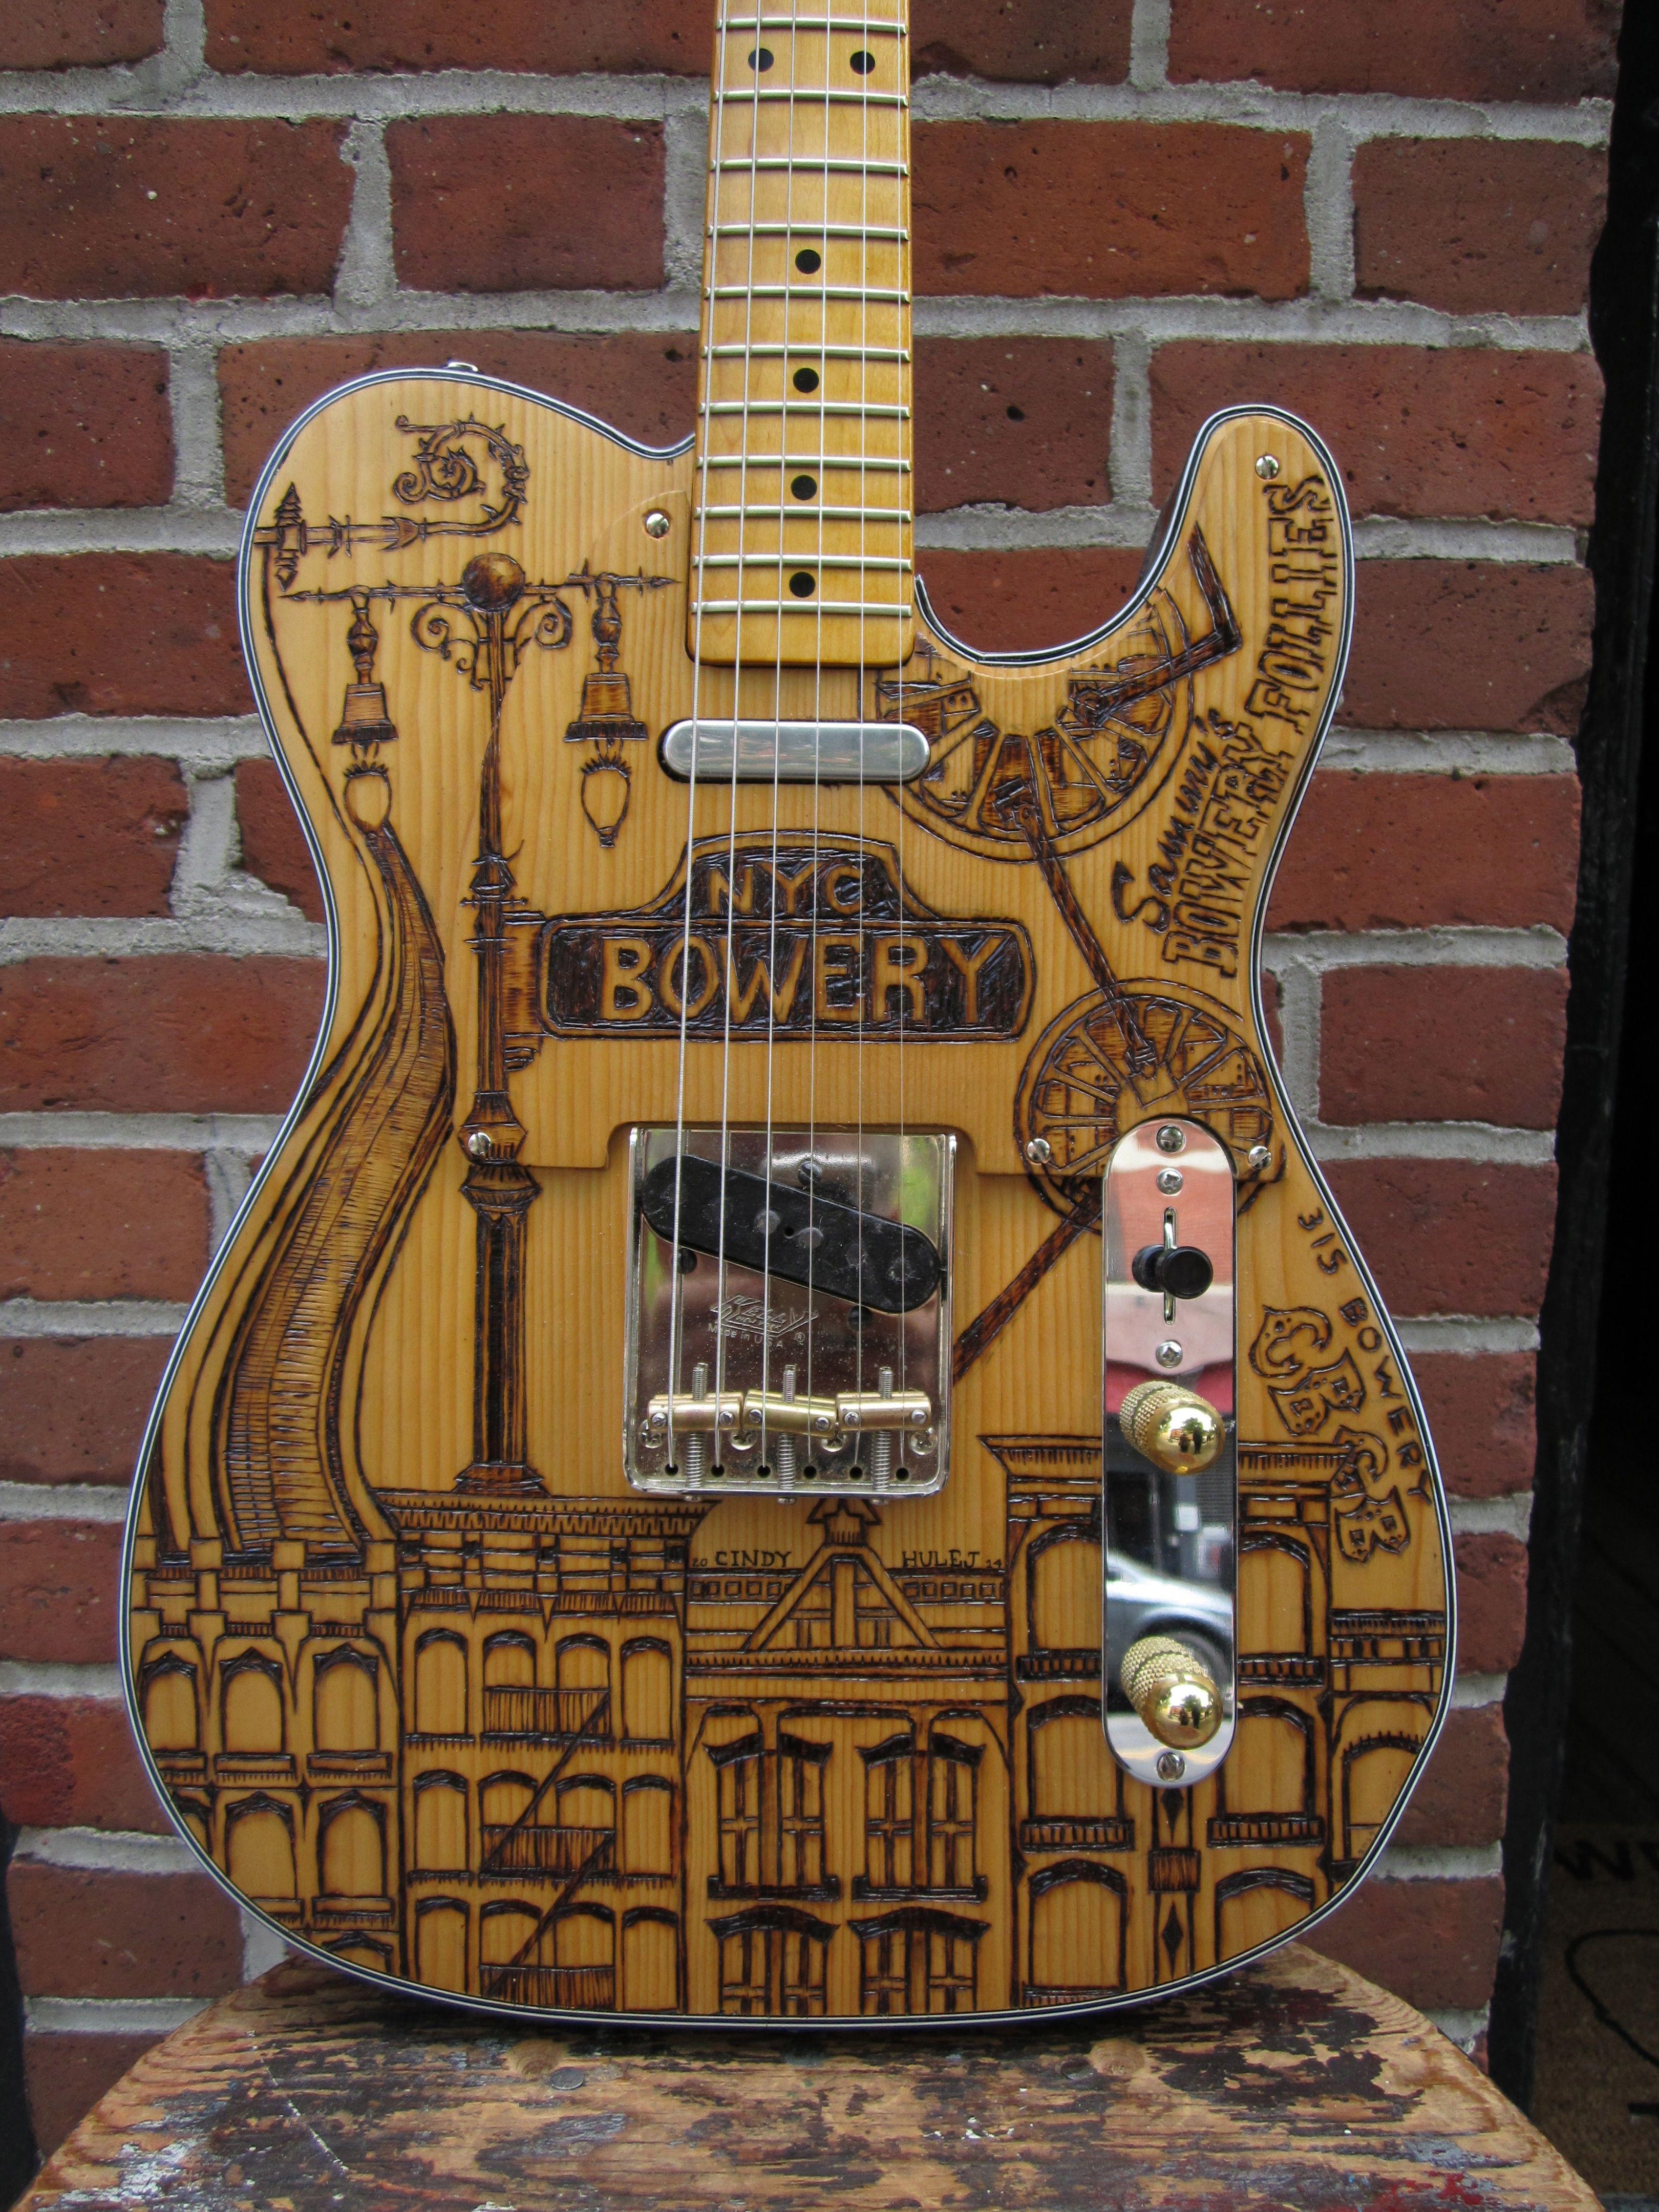 Rick Kelly Bowery Pine Kellecaster art by Cindy Hulej Rick Kelly Guitars New York